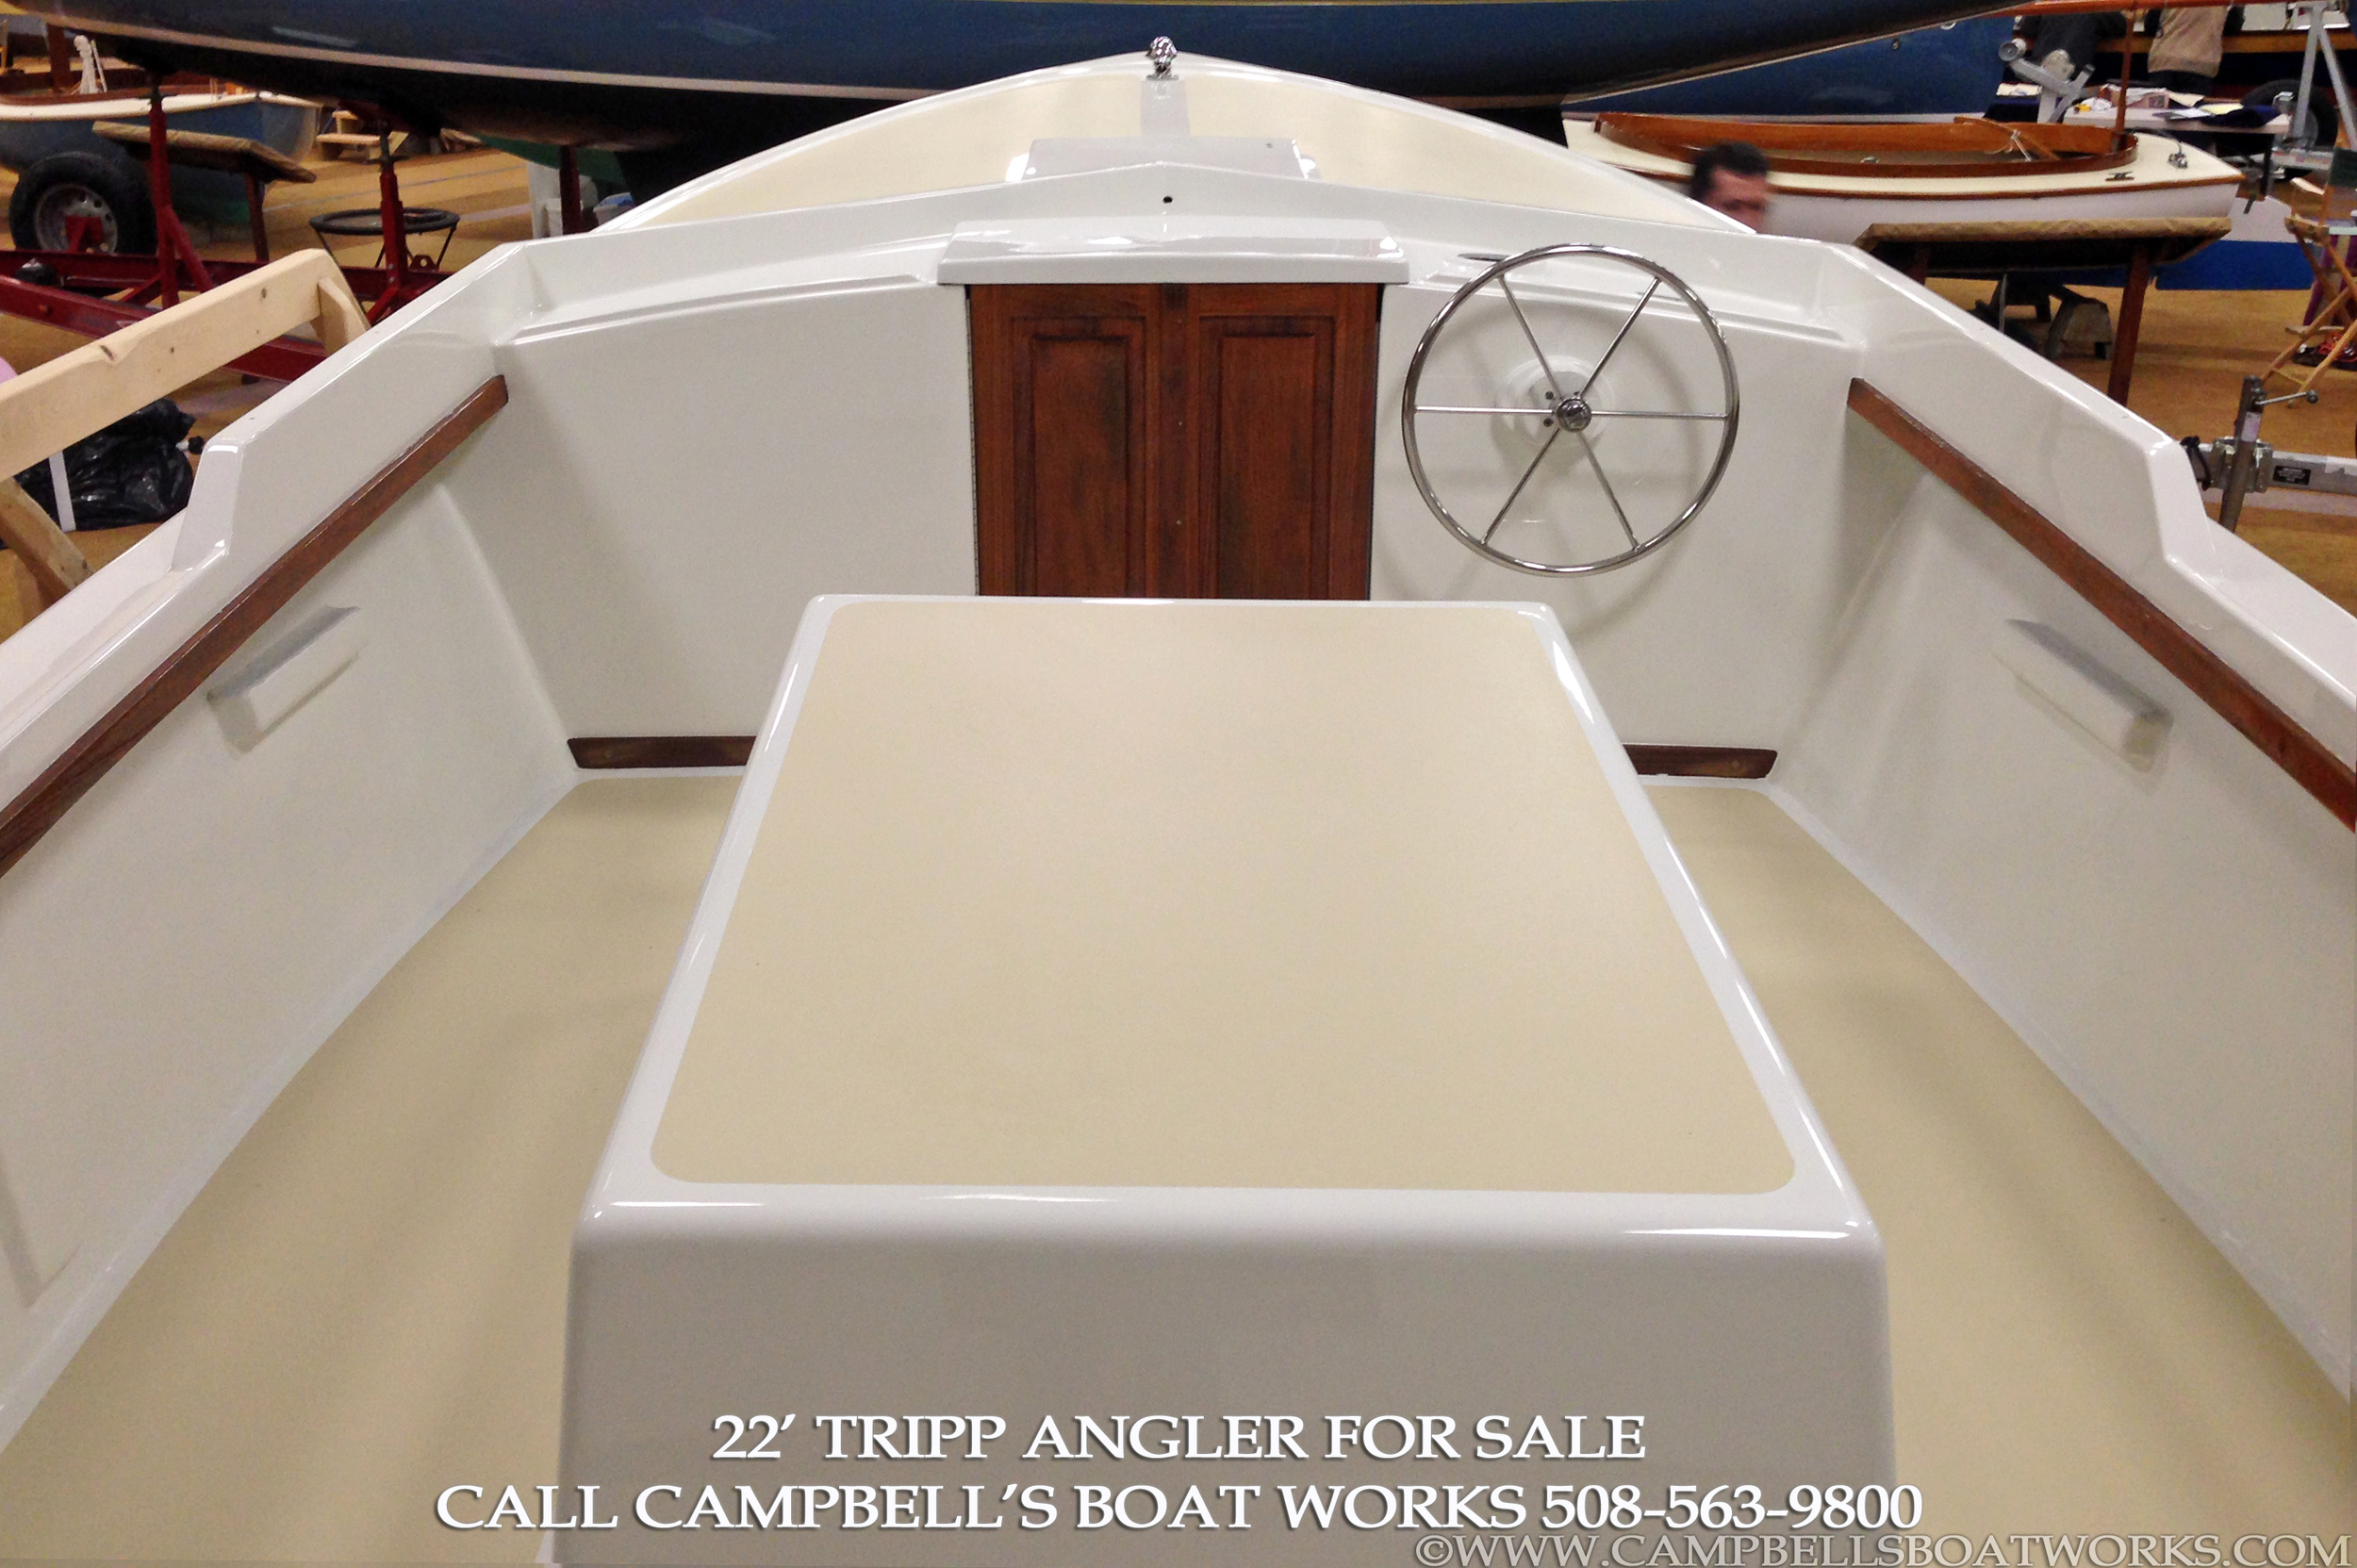 22' Tripp Angler for Sale